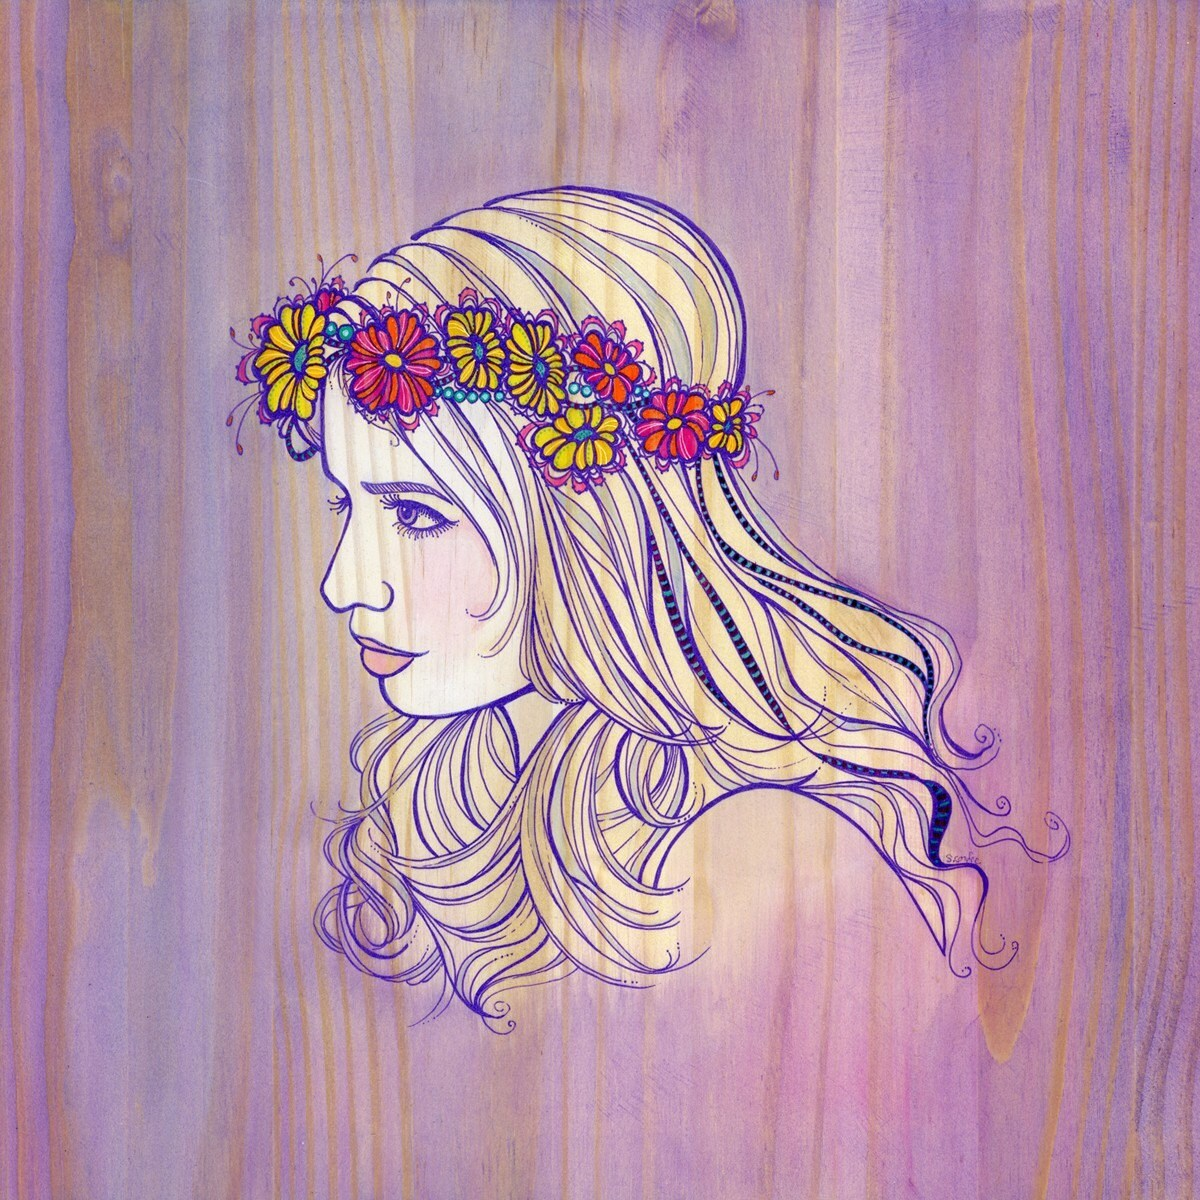 Violet Woodgrain profile - PRINT